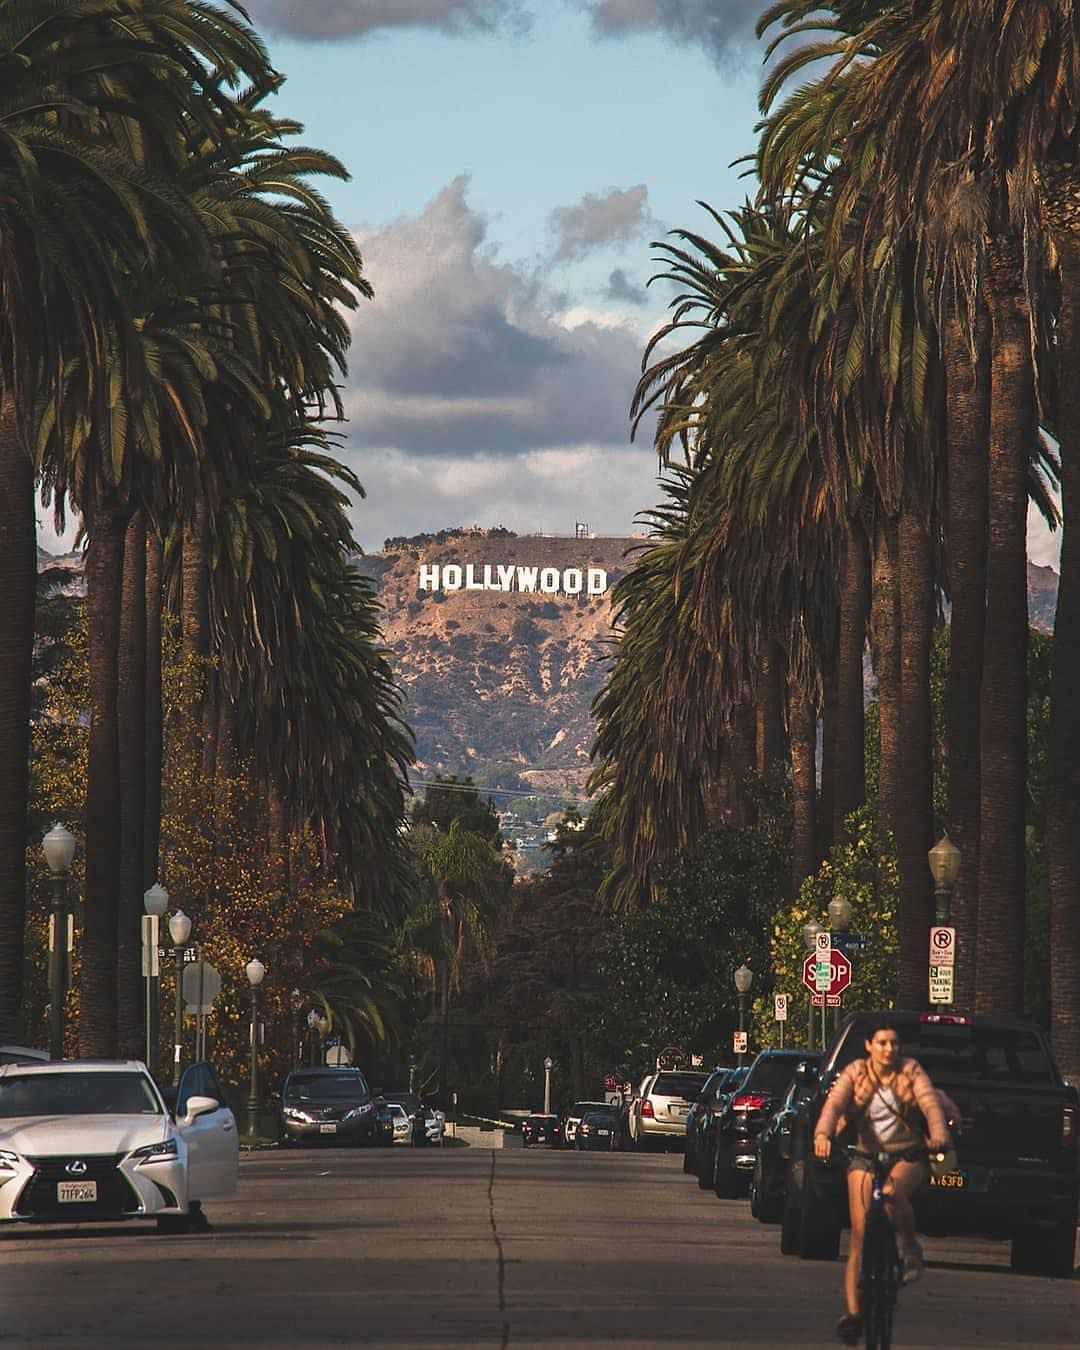 Los Angeles ภาษา สหรัฐอเมริกา